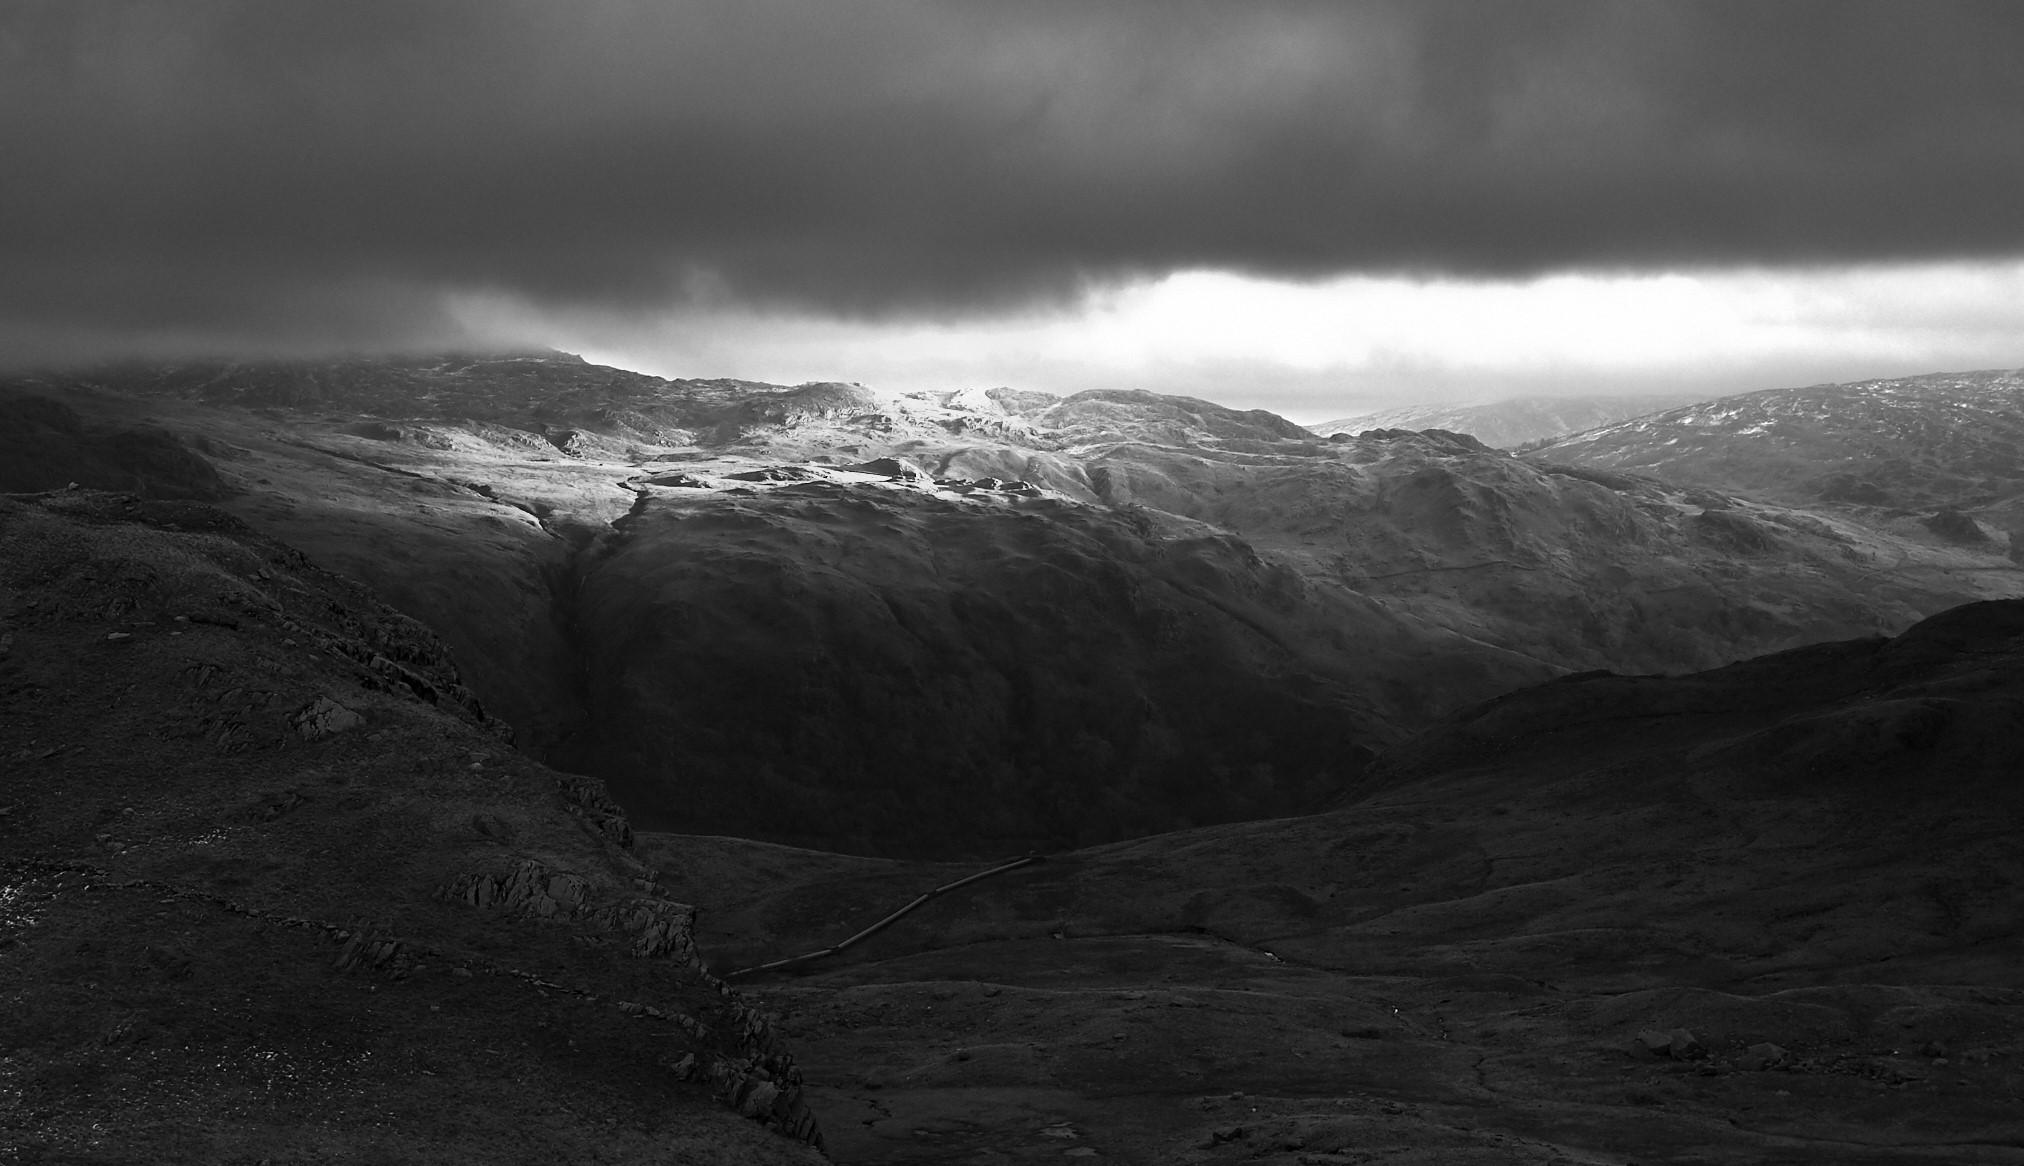 Snowdonia,North Wales 2014